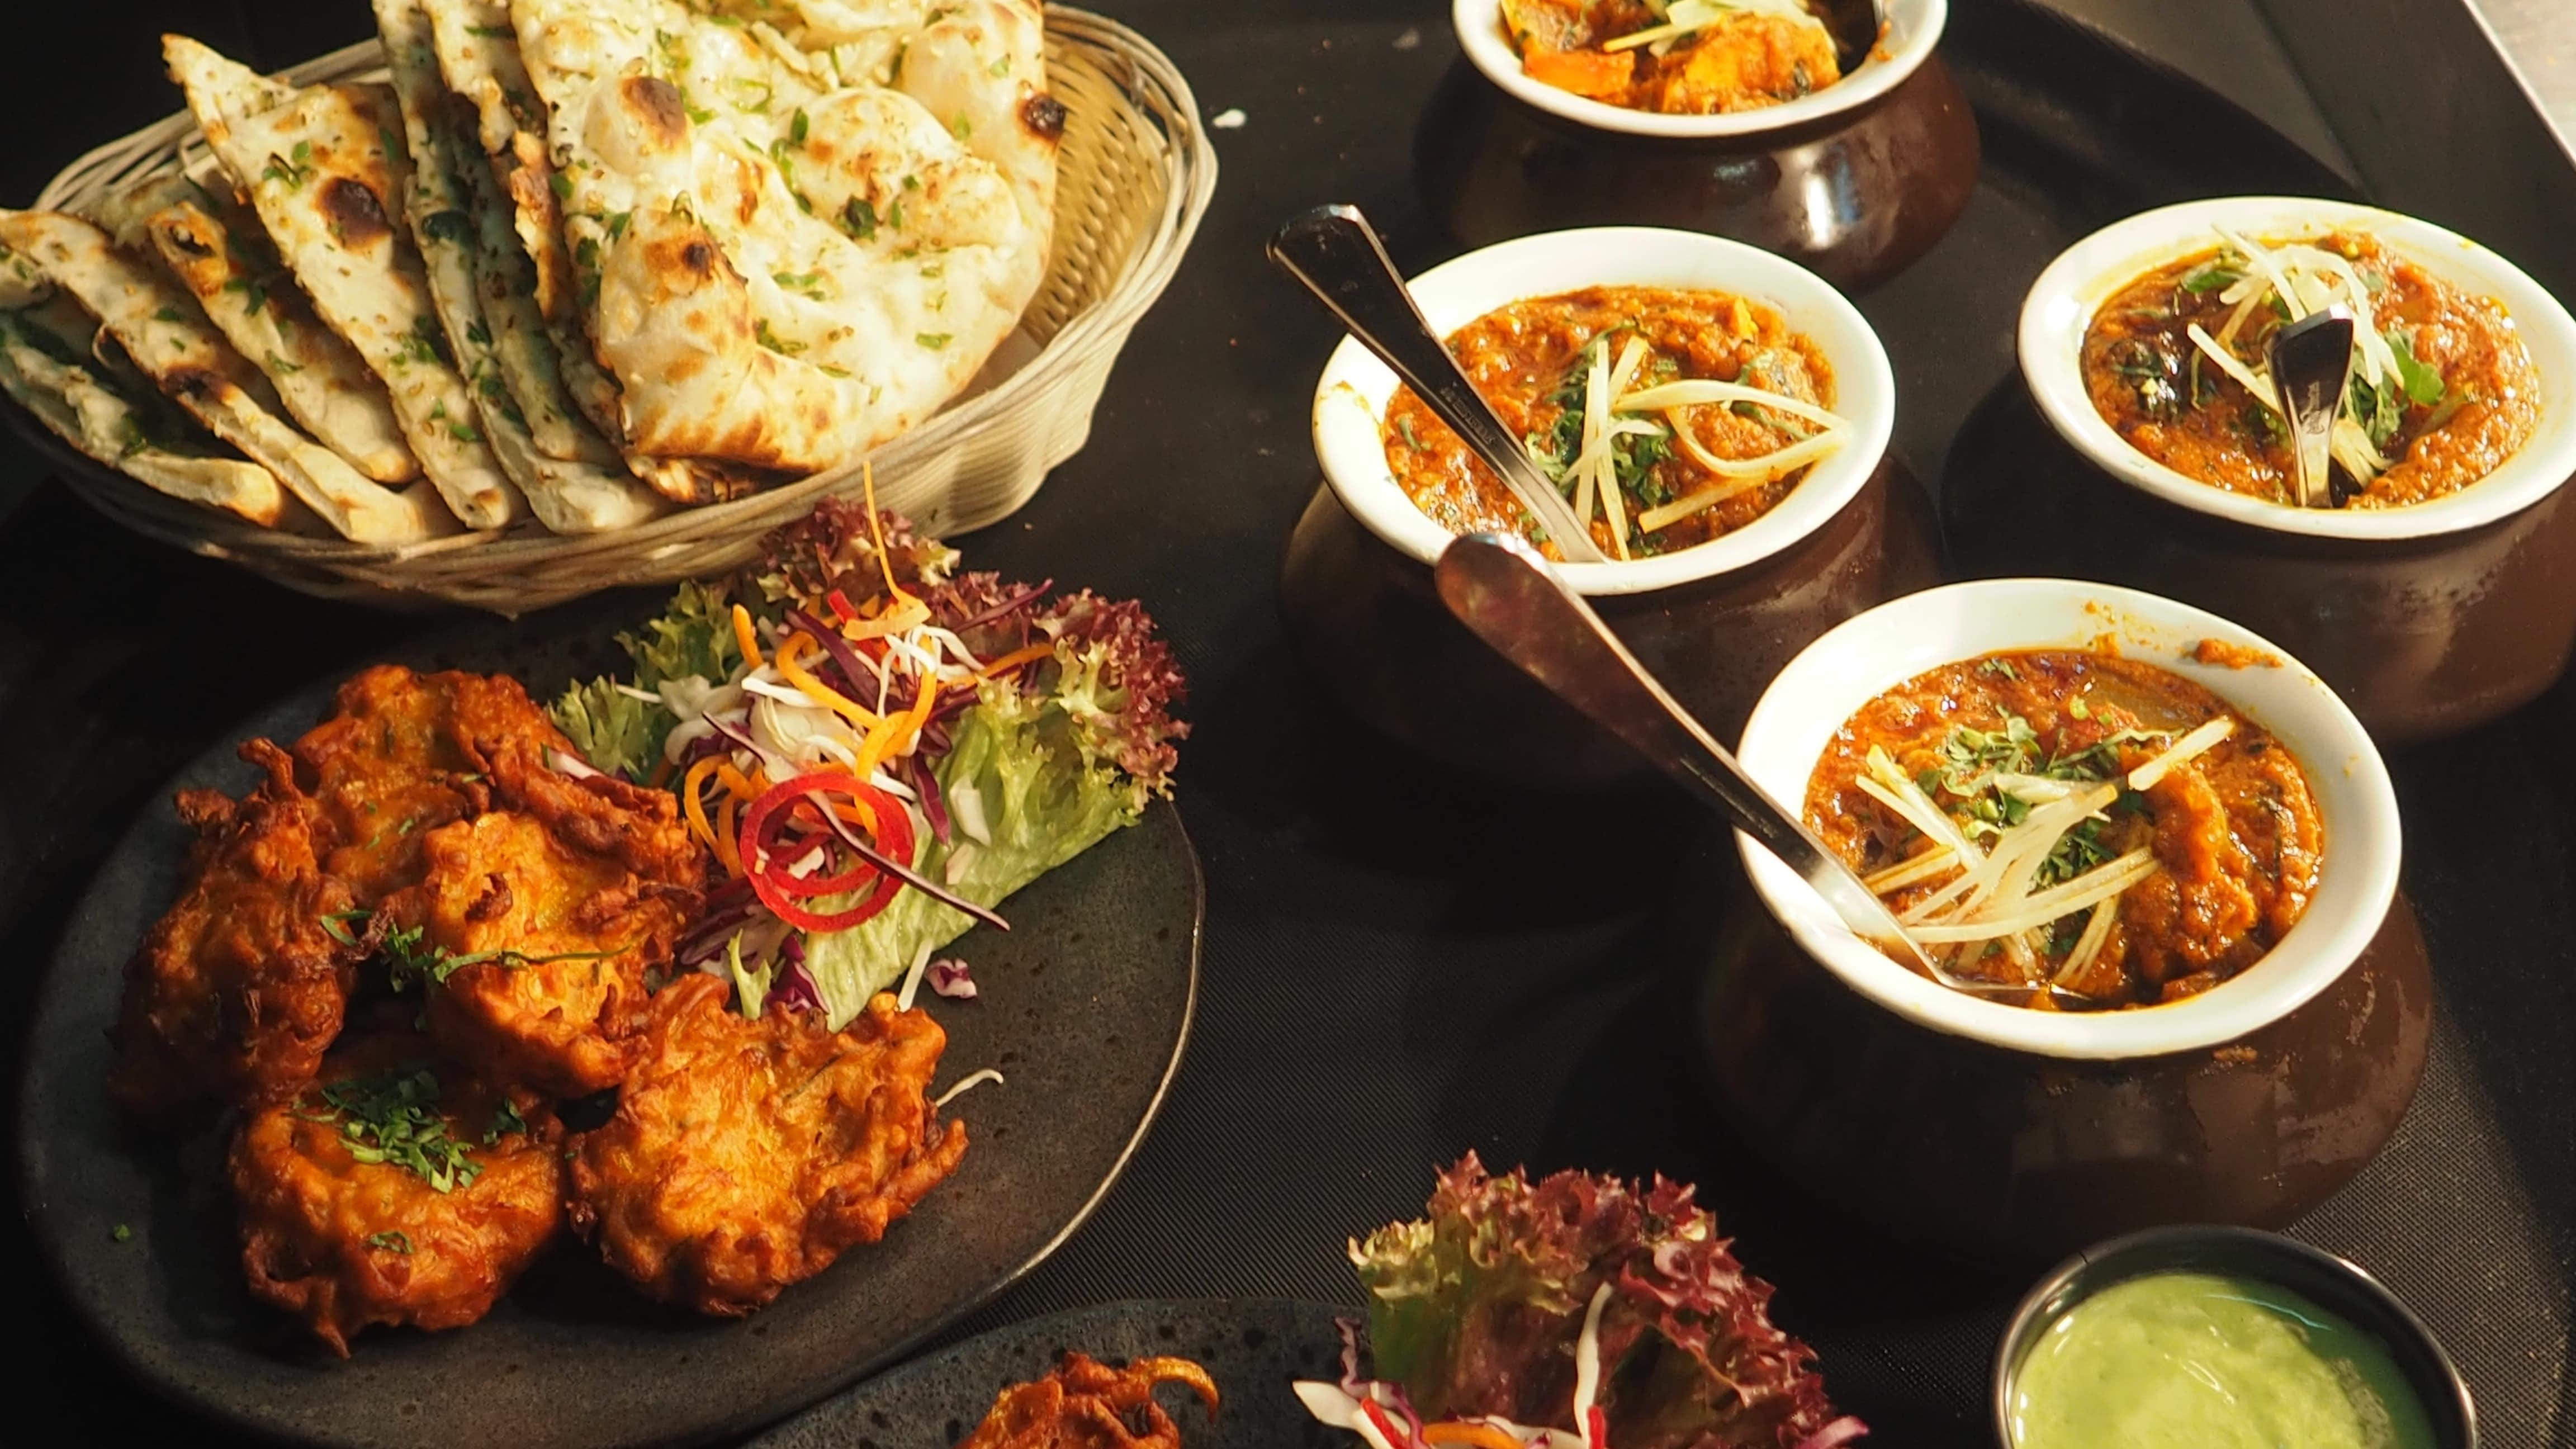 cuisine ile Maurice - gastronomie - voyage culinaire